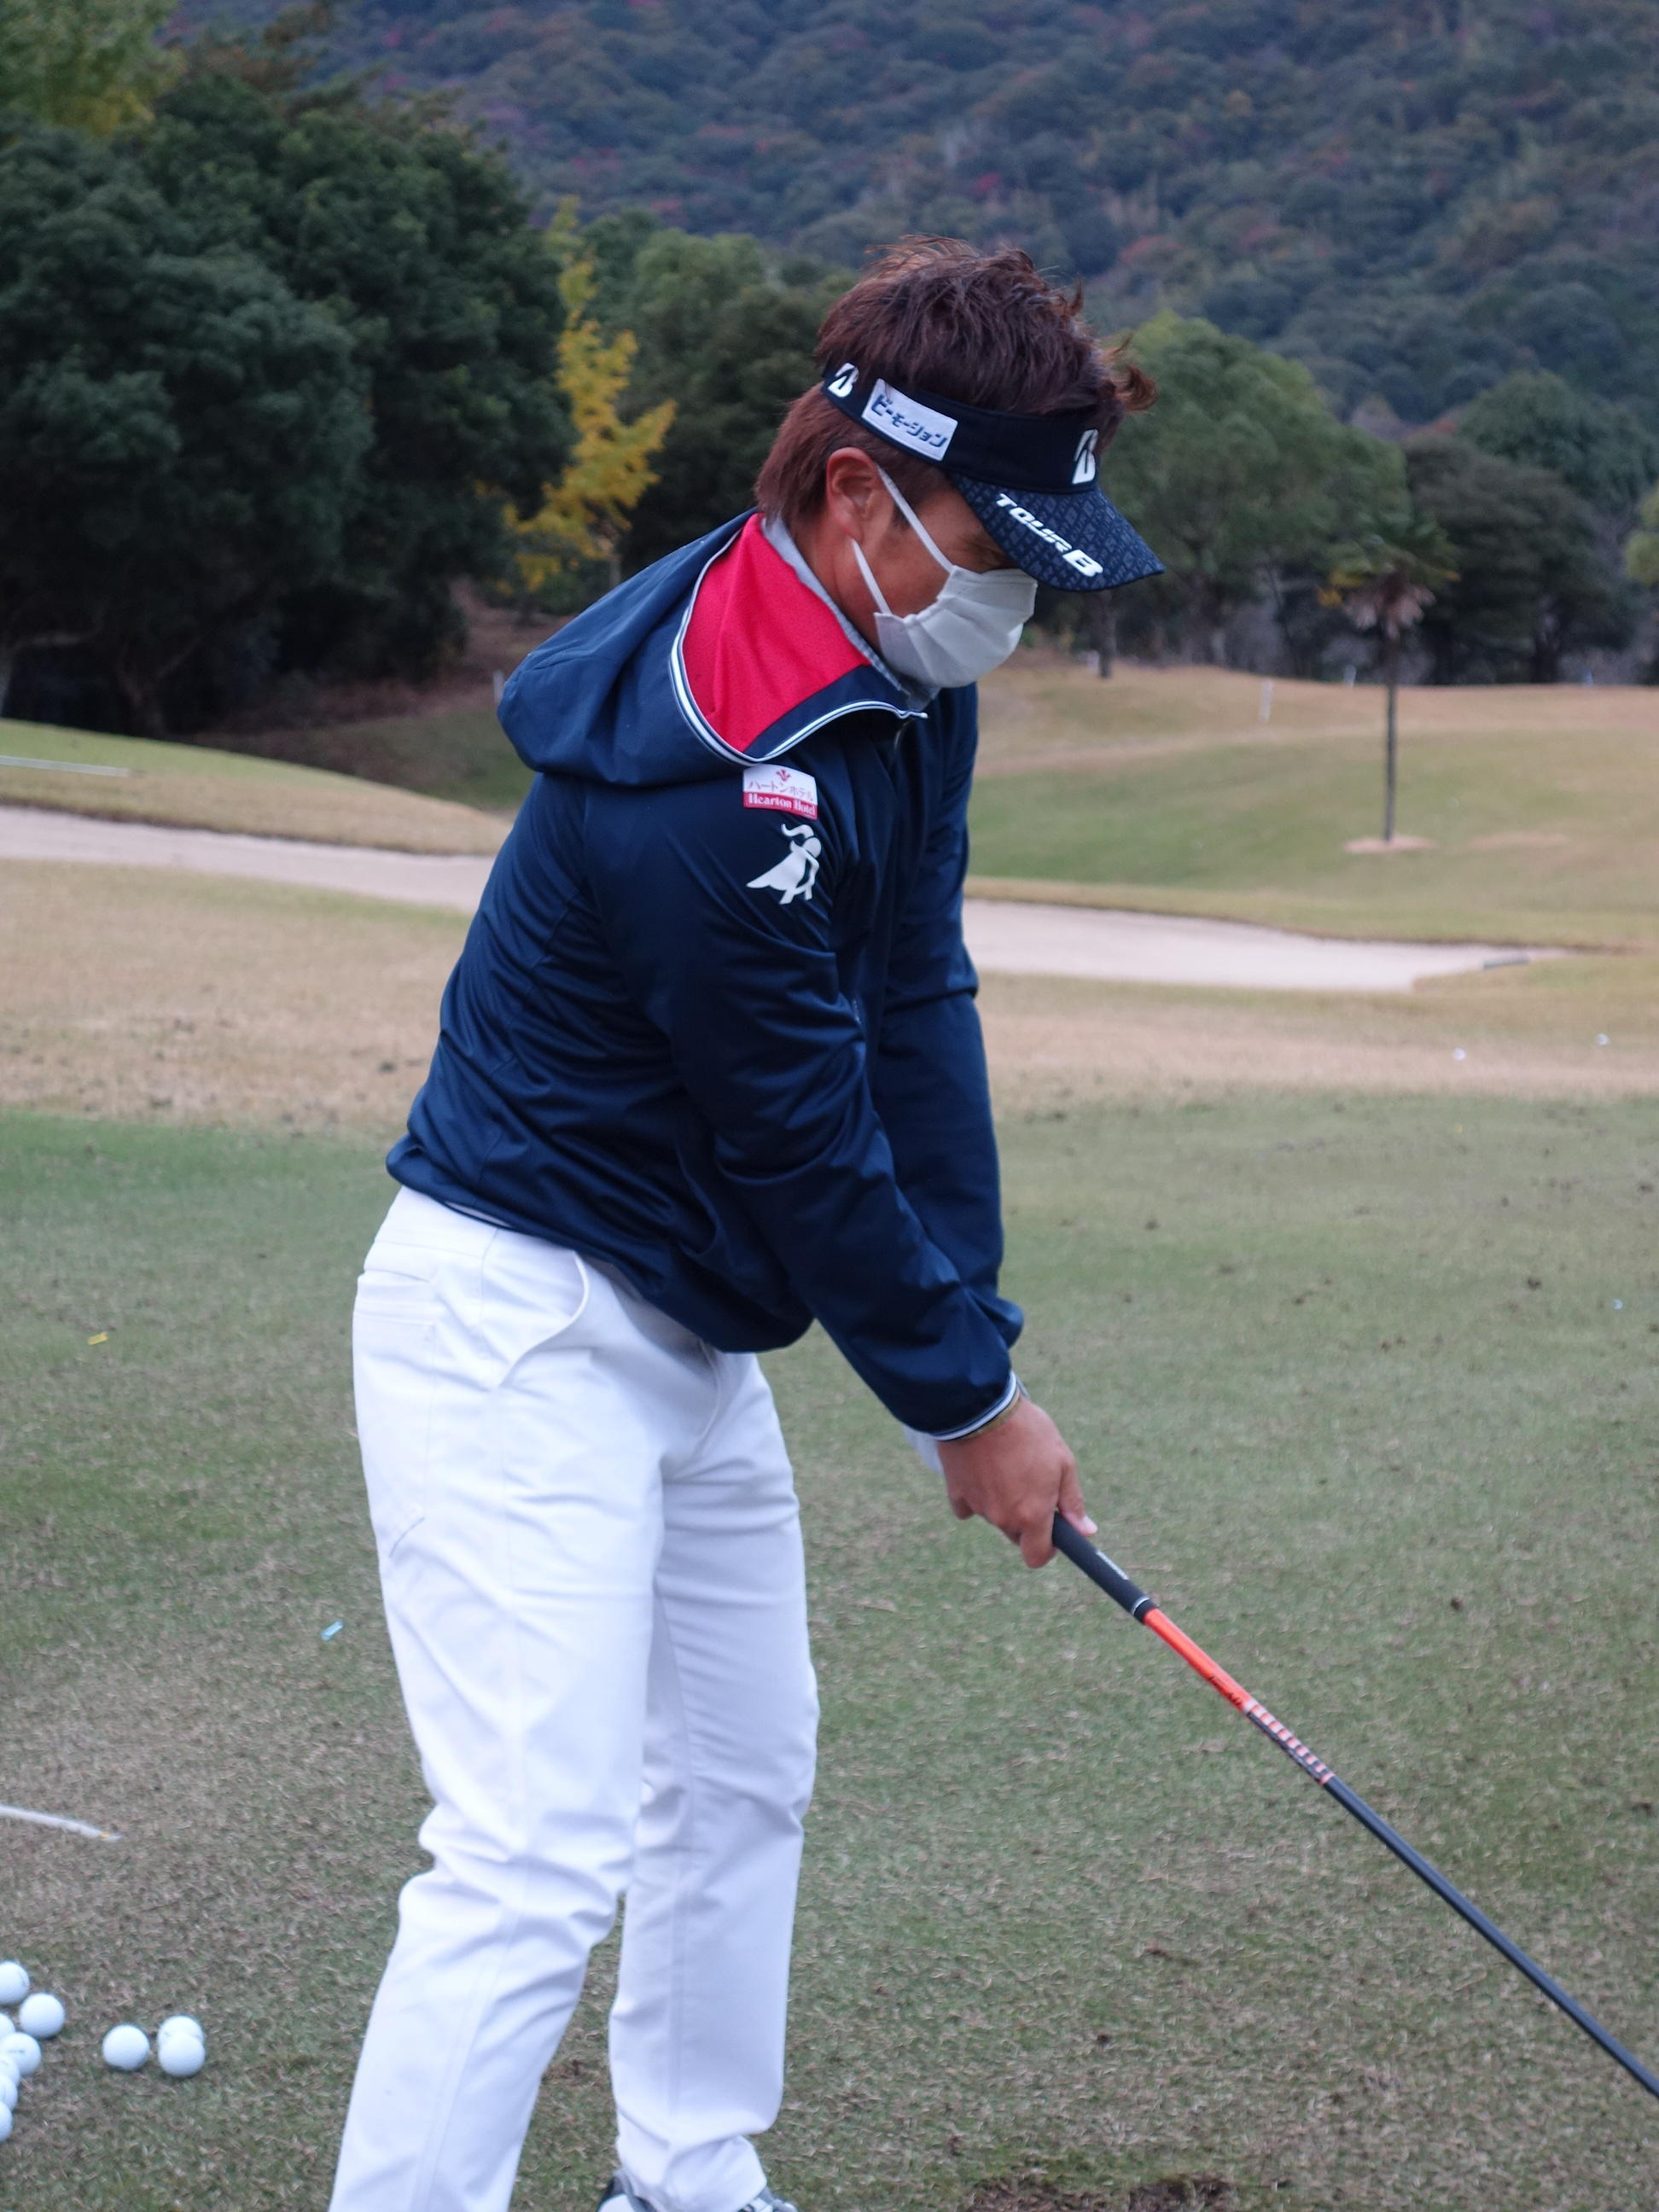 https://www.bs-golf.com/pro/c35d146334dcda9727d4fc496333466ee0a740b7.JPG